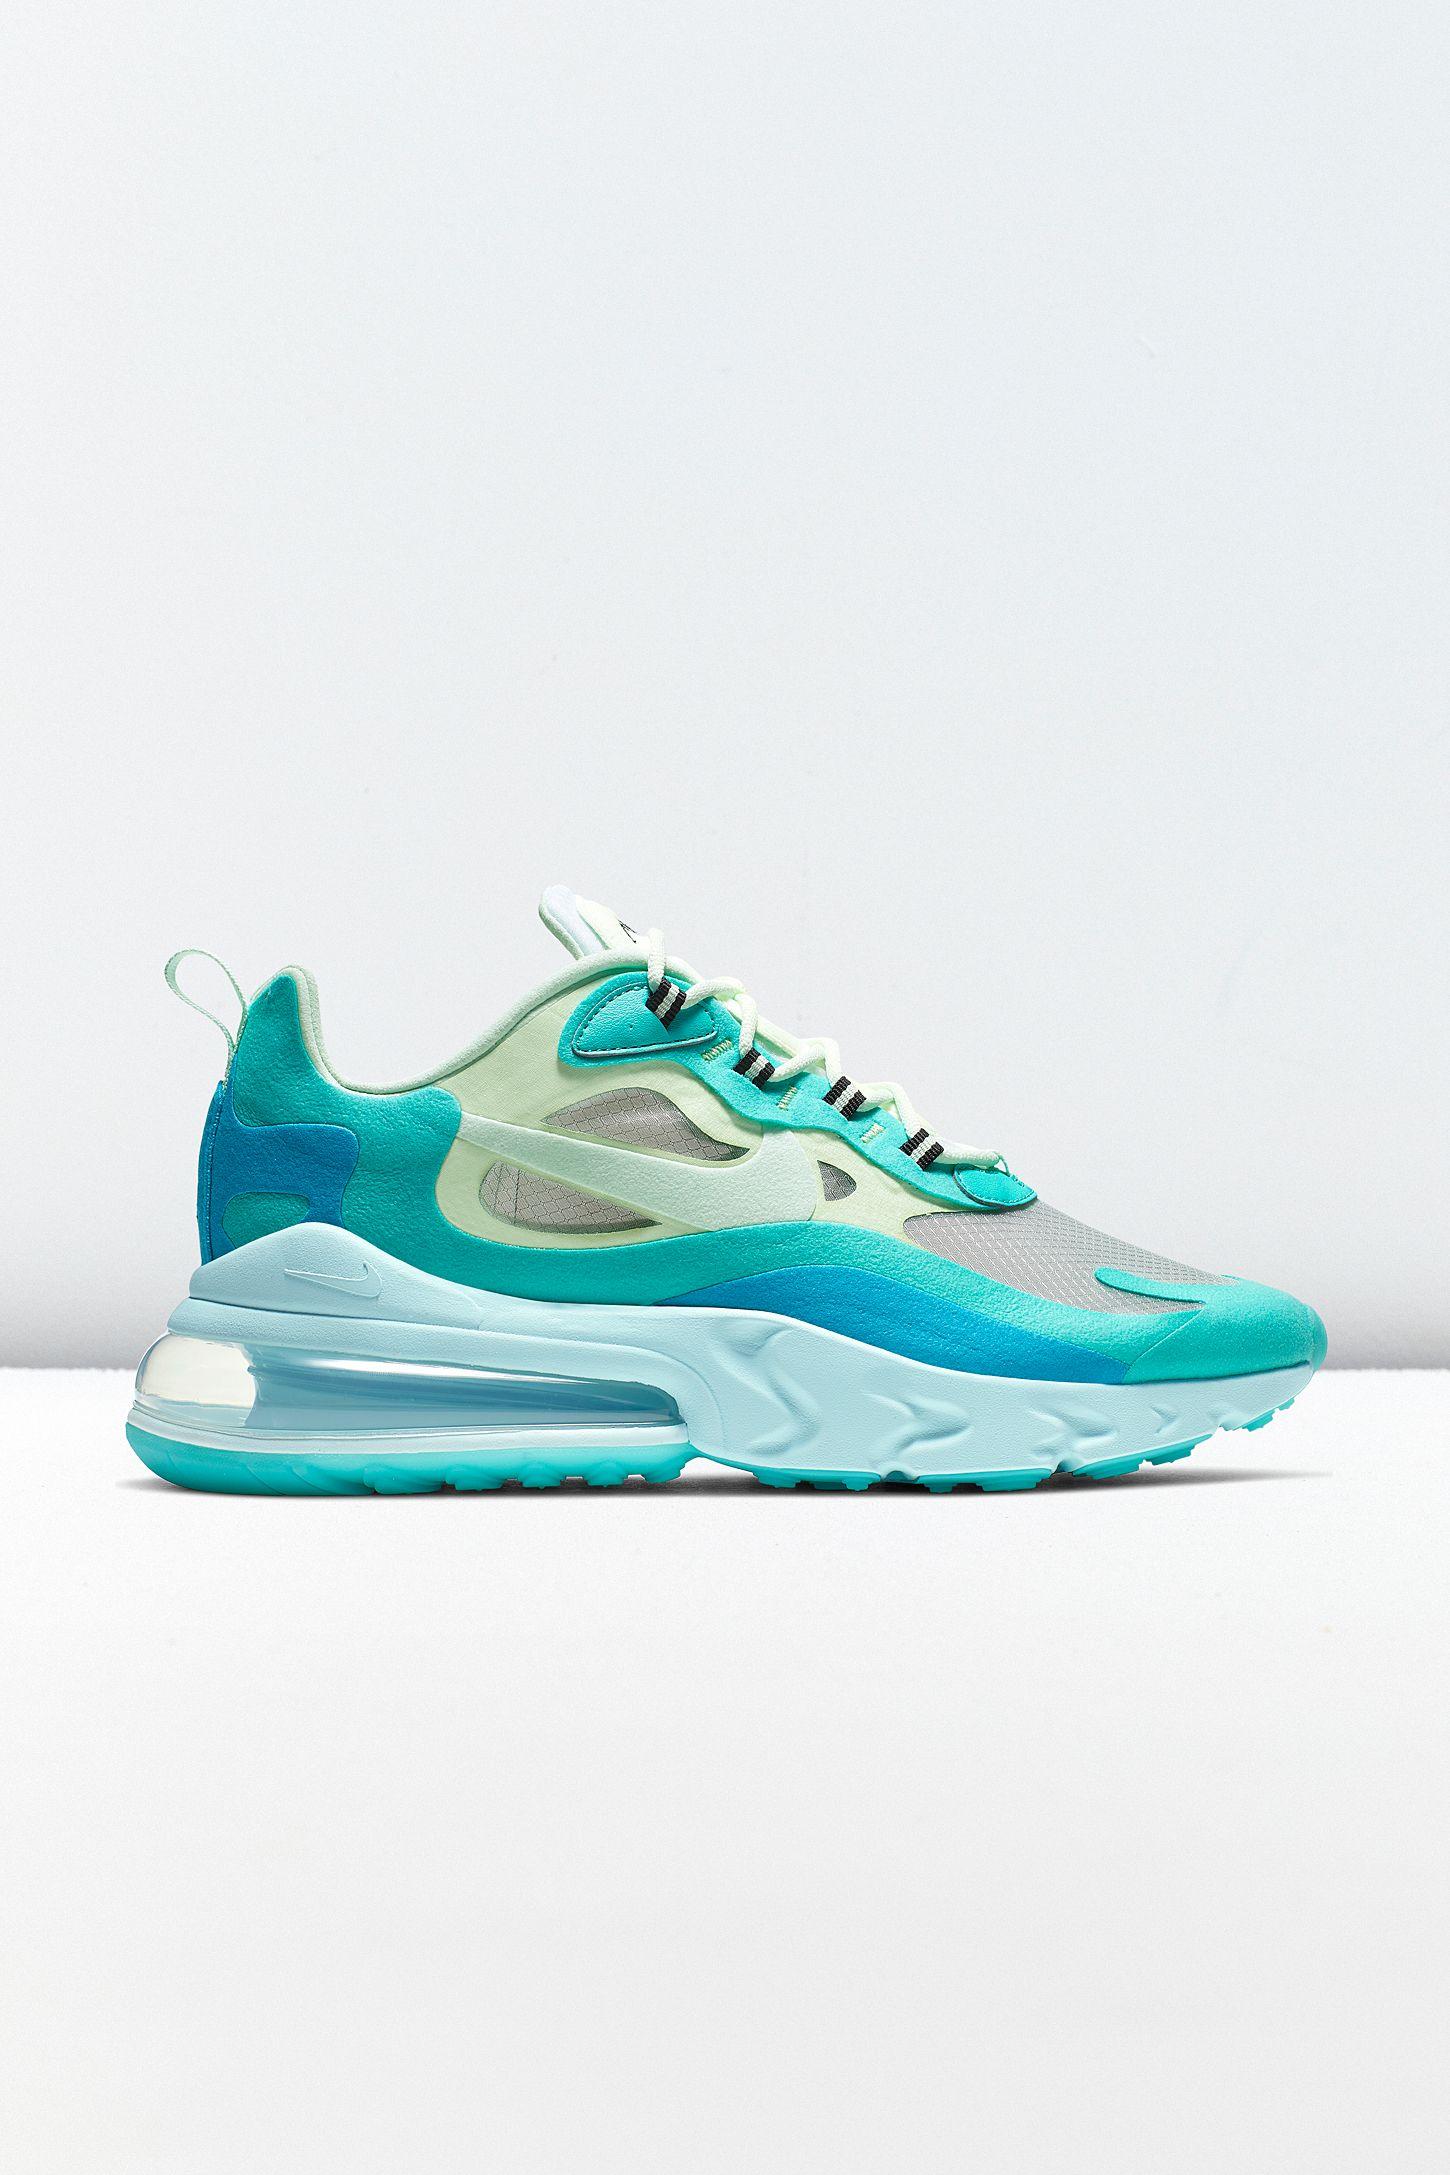 Nike Air Max 270 Sneaker Blue | Urban Outfitters